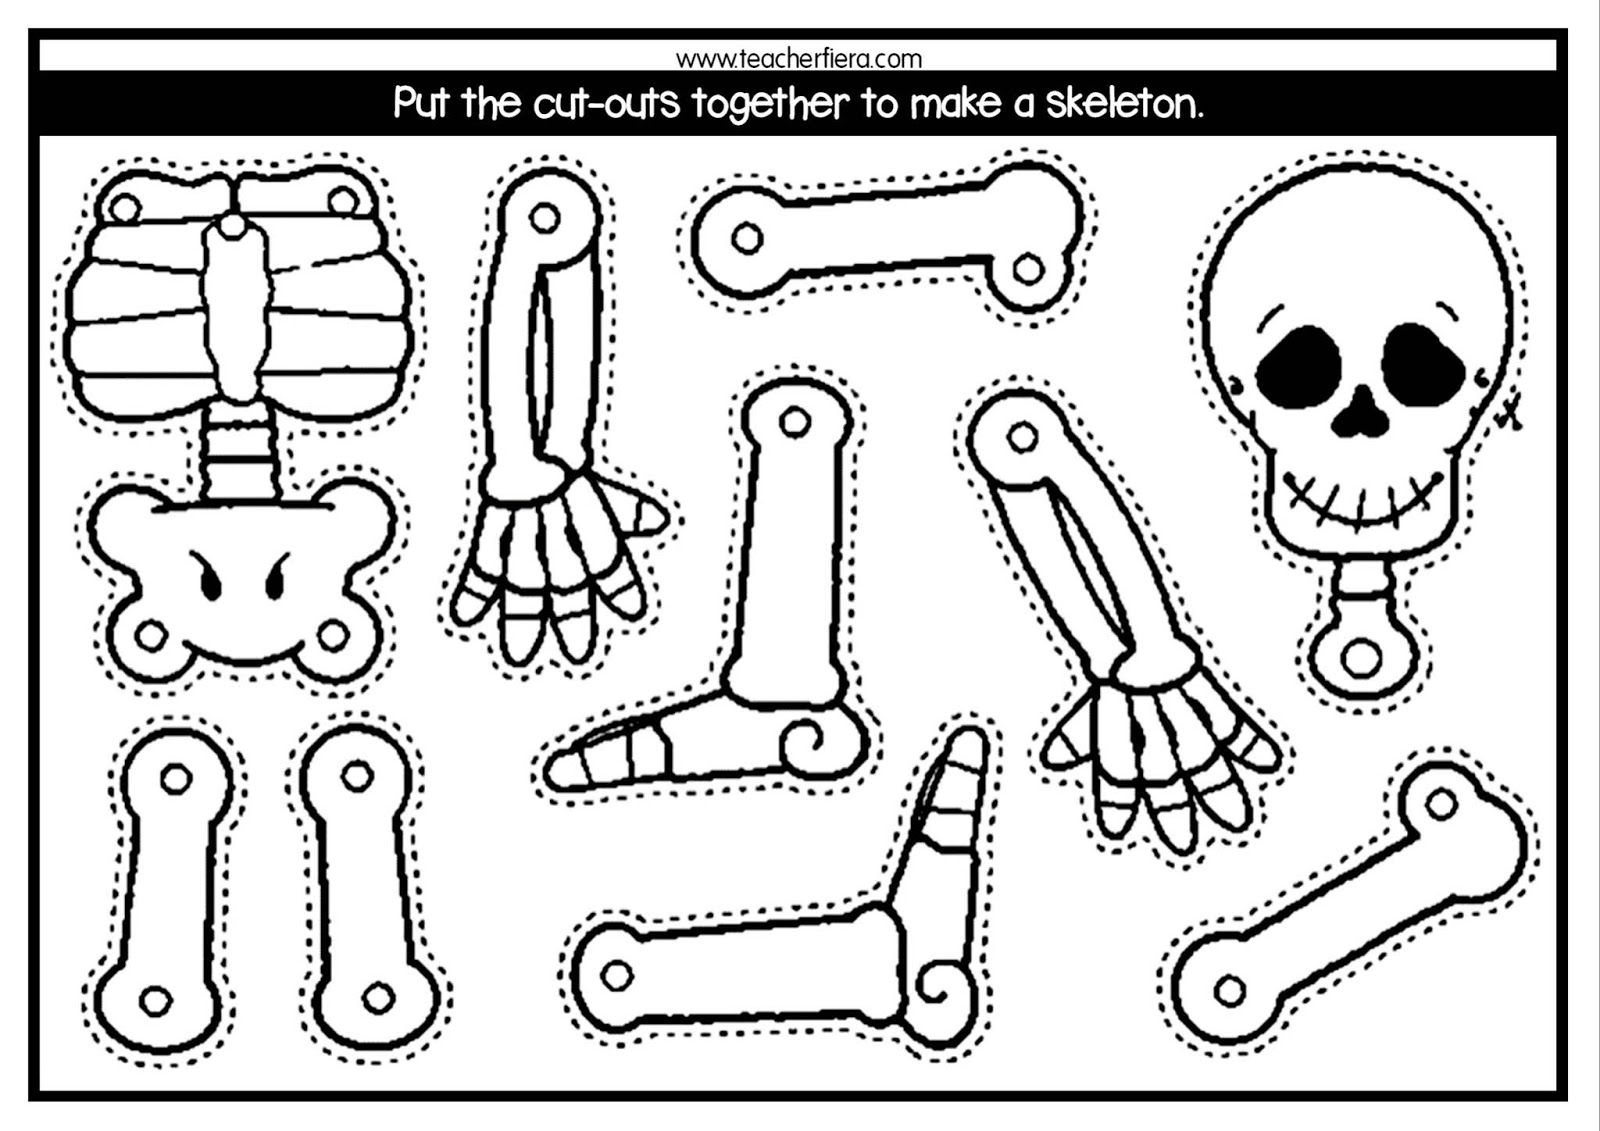 medium resolution of Build A Skeleton Worksheet   Printable Worksheets and Activities for  Teachers